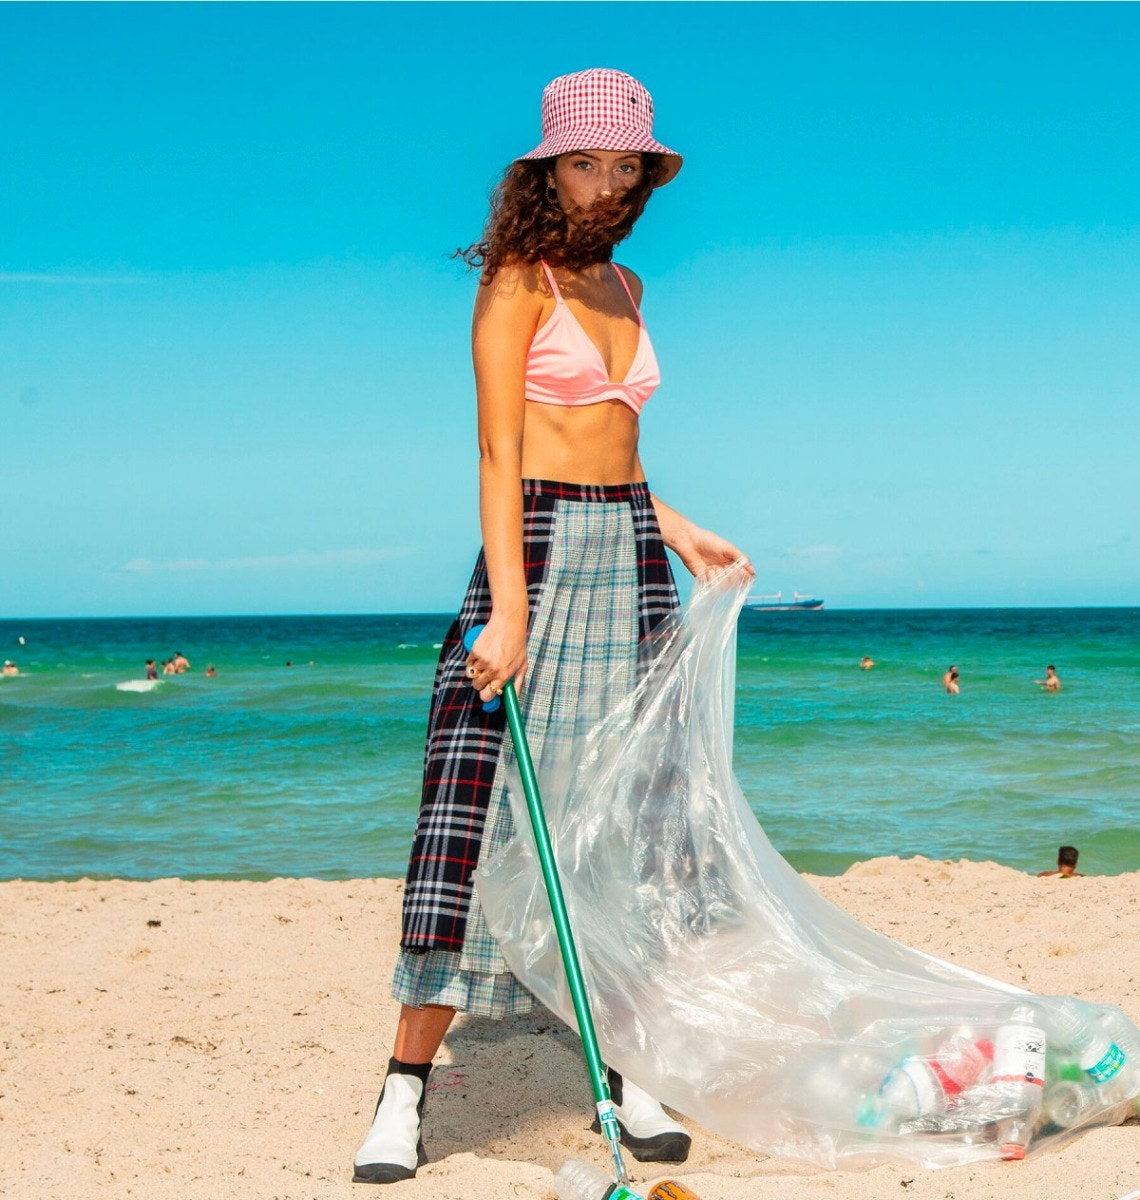 RENTRAYAGE Skirt